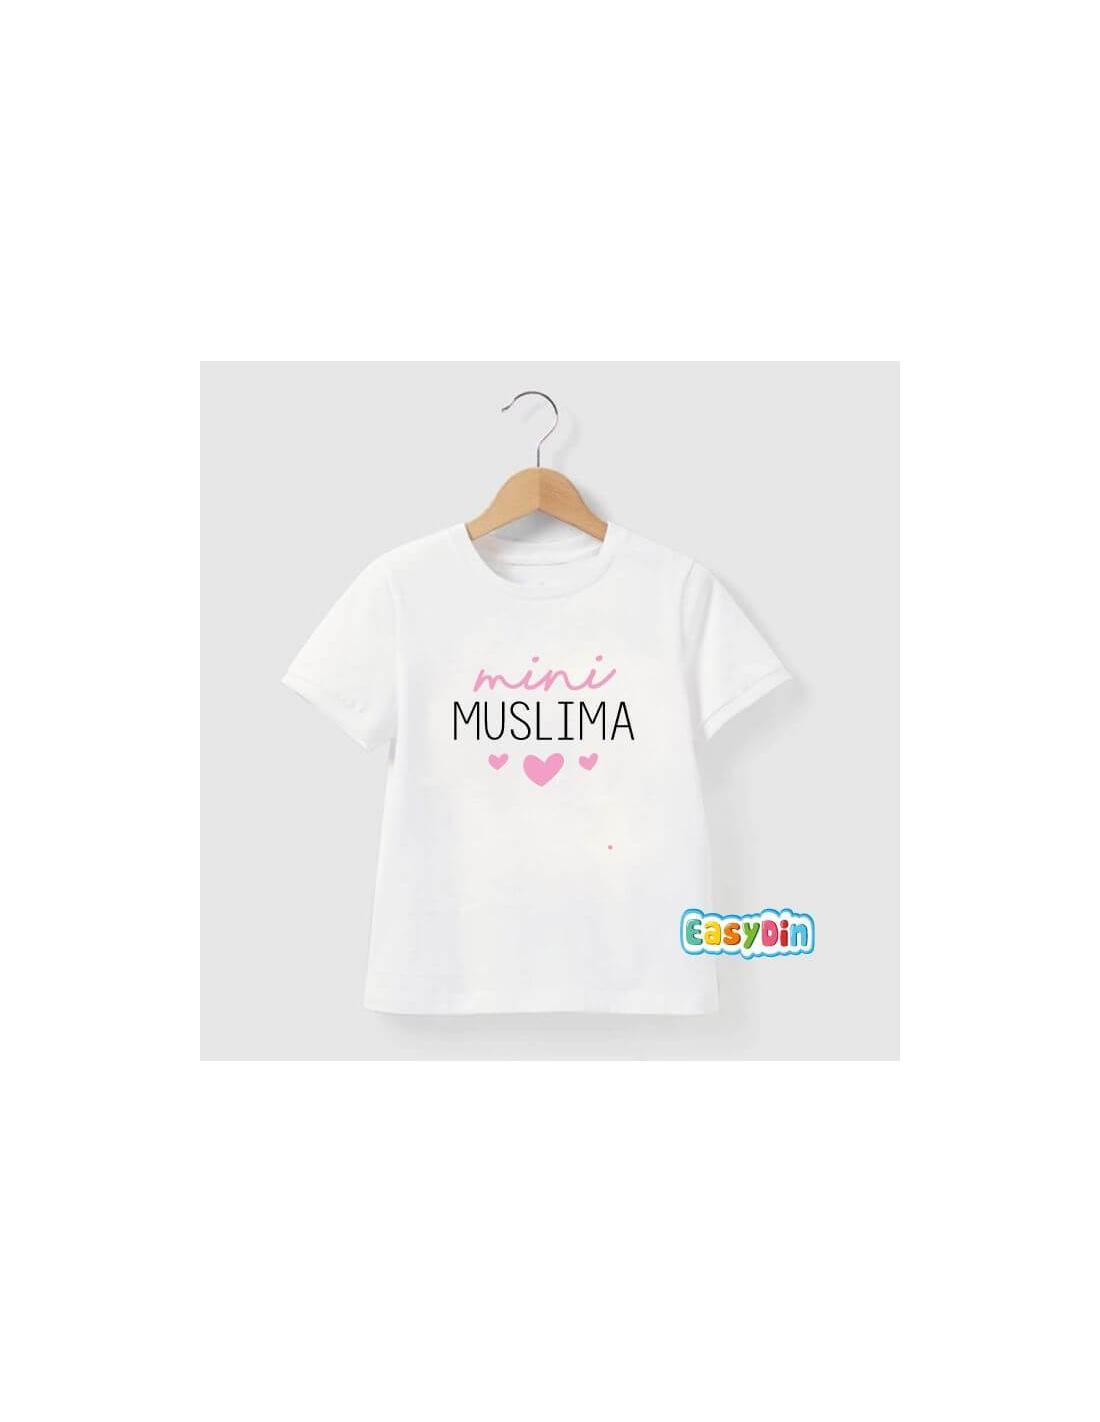 mini muslima tee shirt enfant musulmane